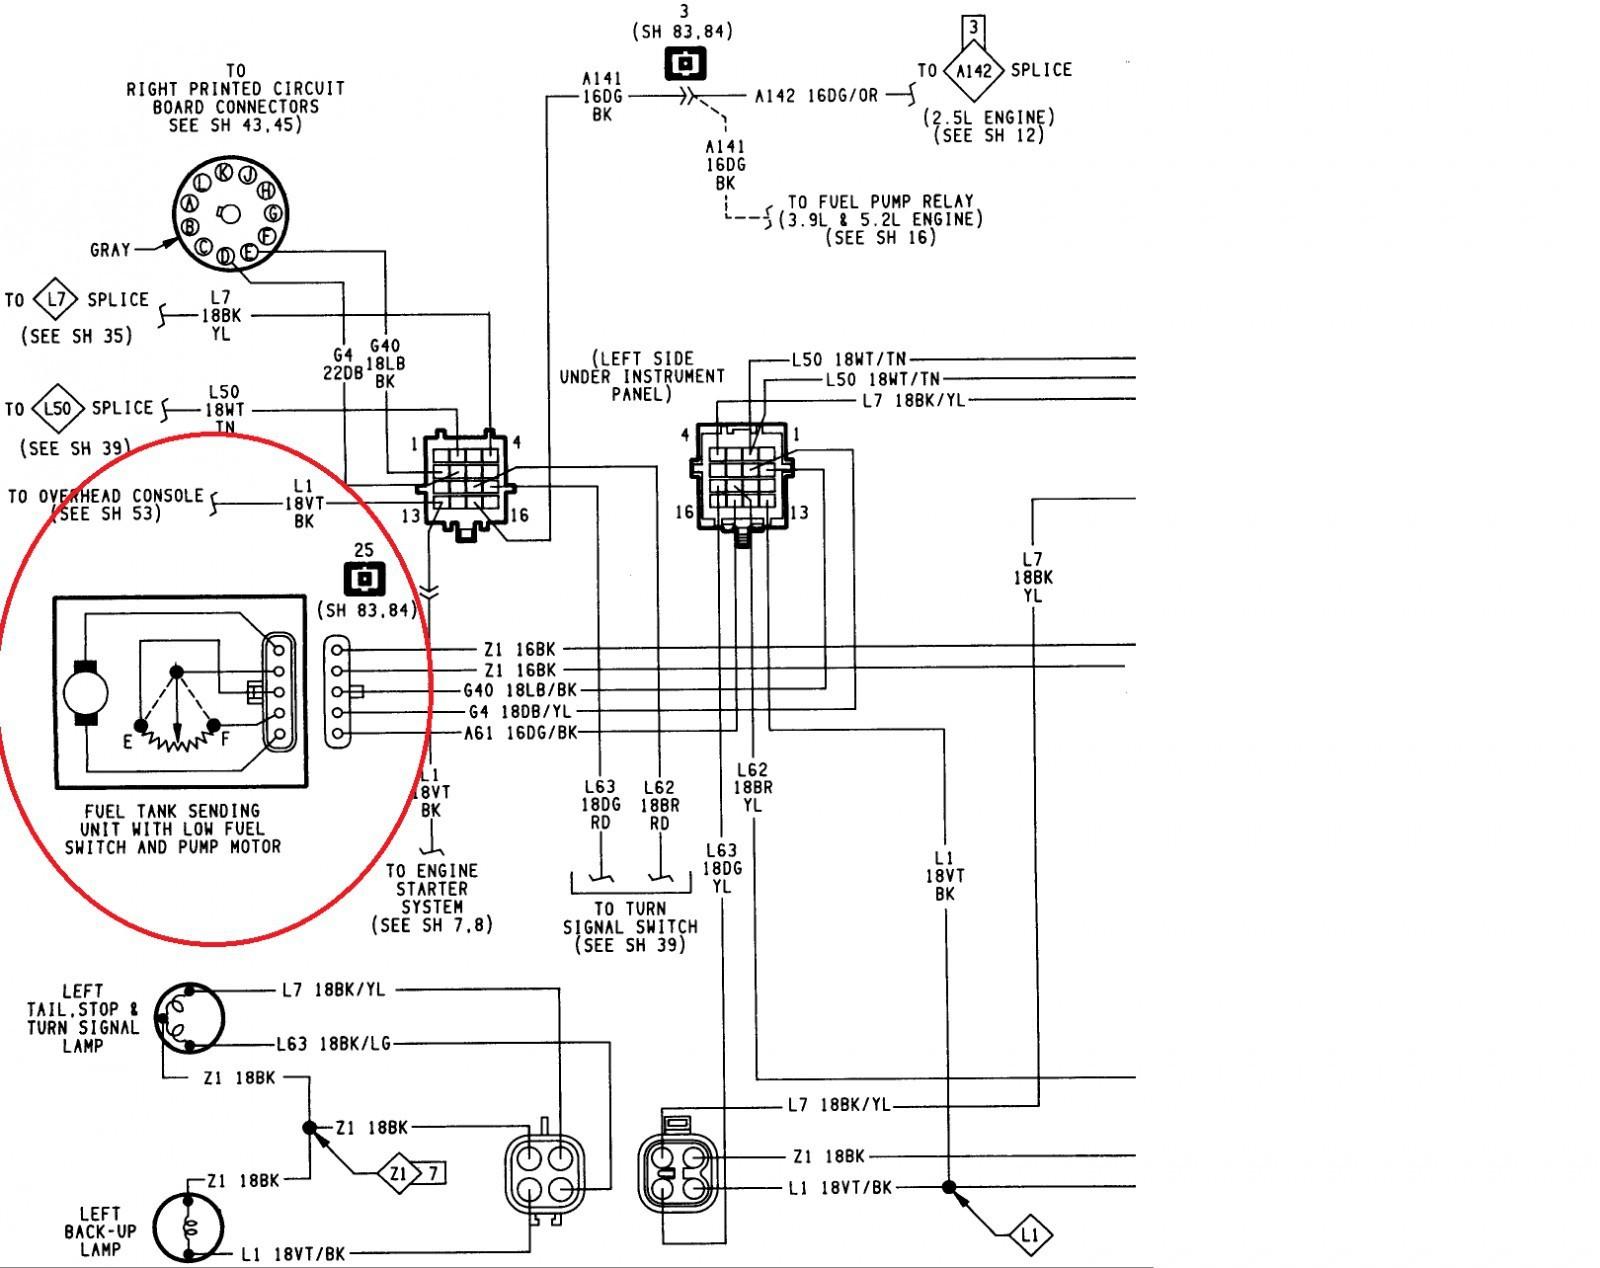 Yamaha Outboard Tachometer Wiring Diagram Wiring Diagram Image Tekonsha  Voyager Wiring-Diagram Yamaha Digital Gauge Wiring Diagram